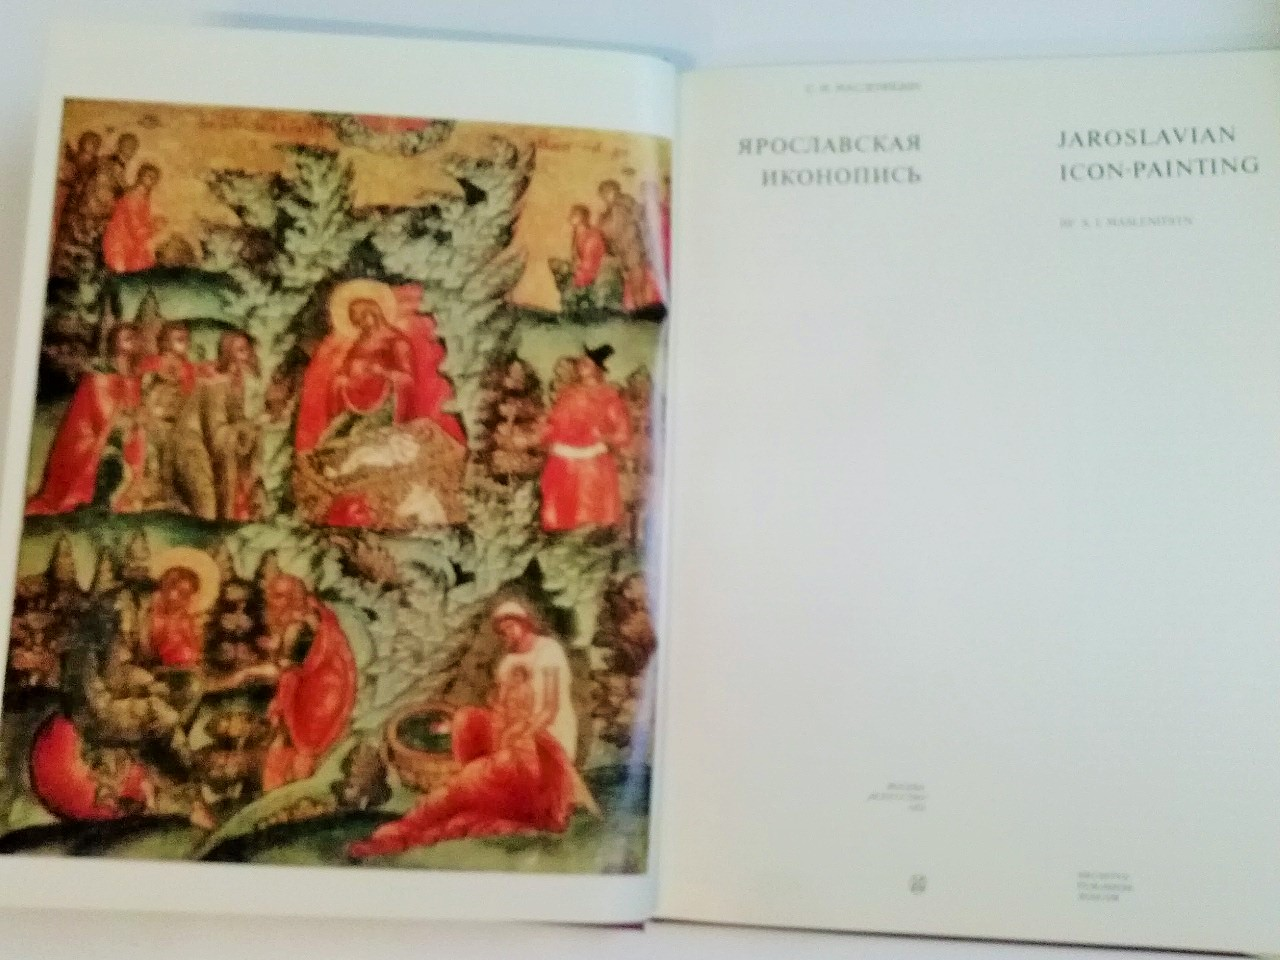 YAROSLAVIAN ICON-PAINTING  IKONY  DUÅ»Y ALBUM